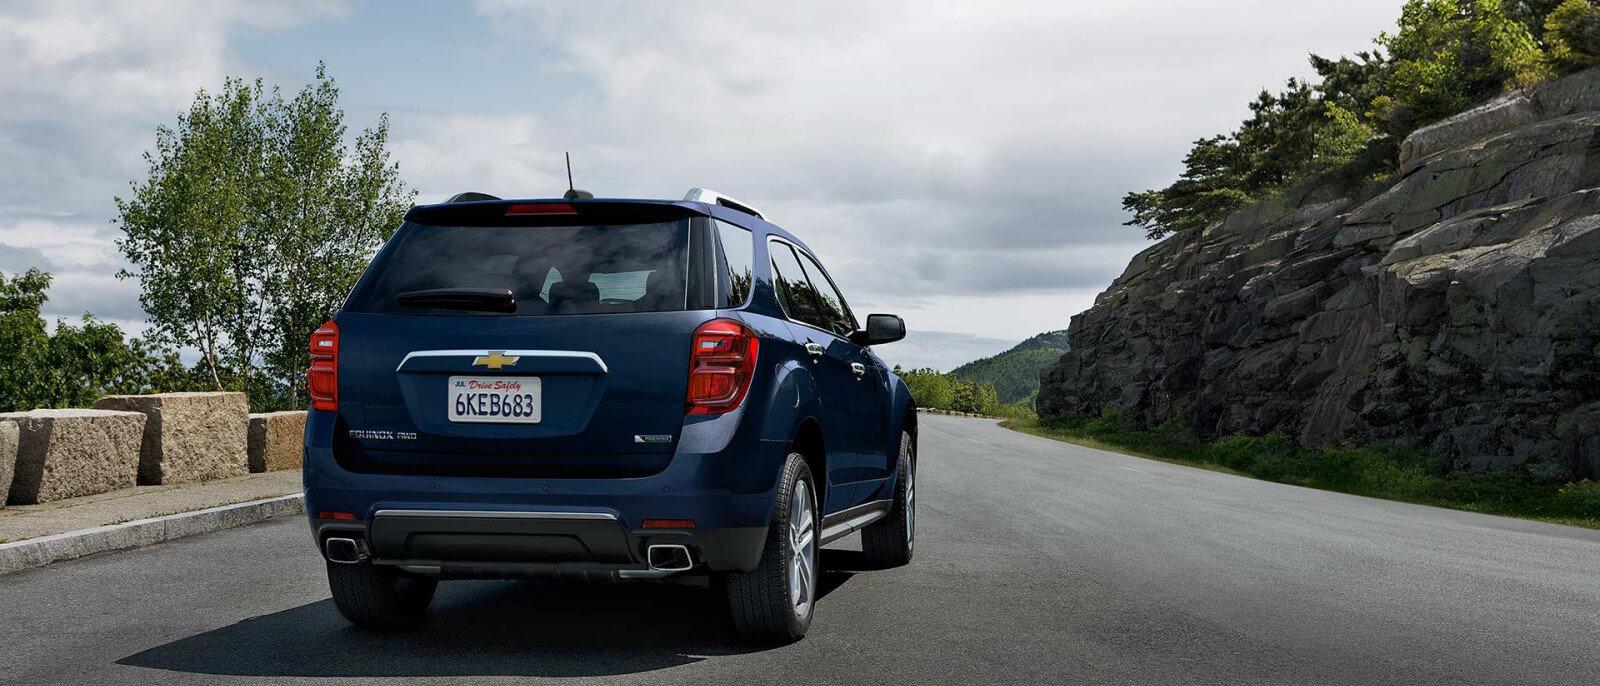 Chevrolet Equinox rear exterior